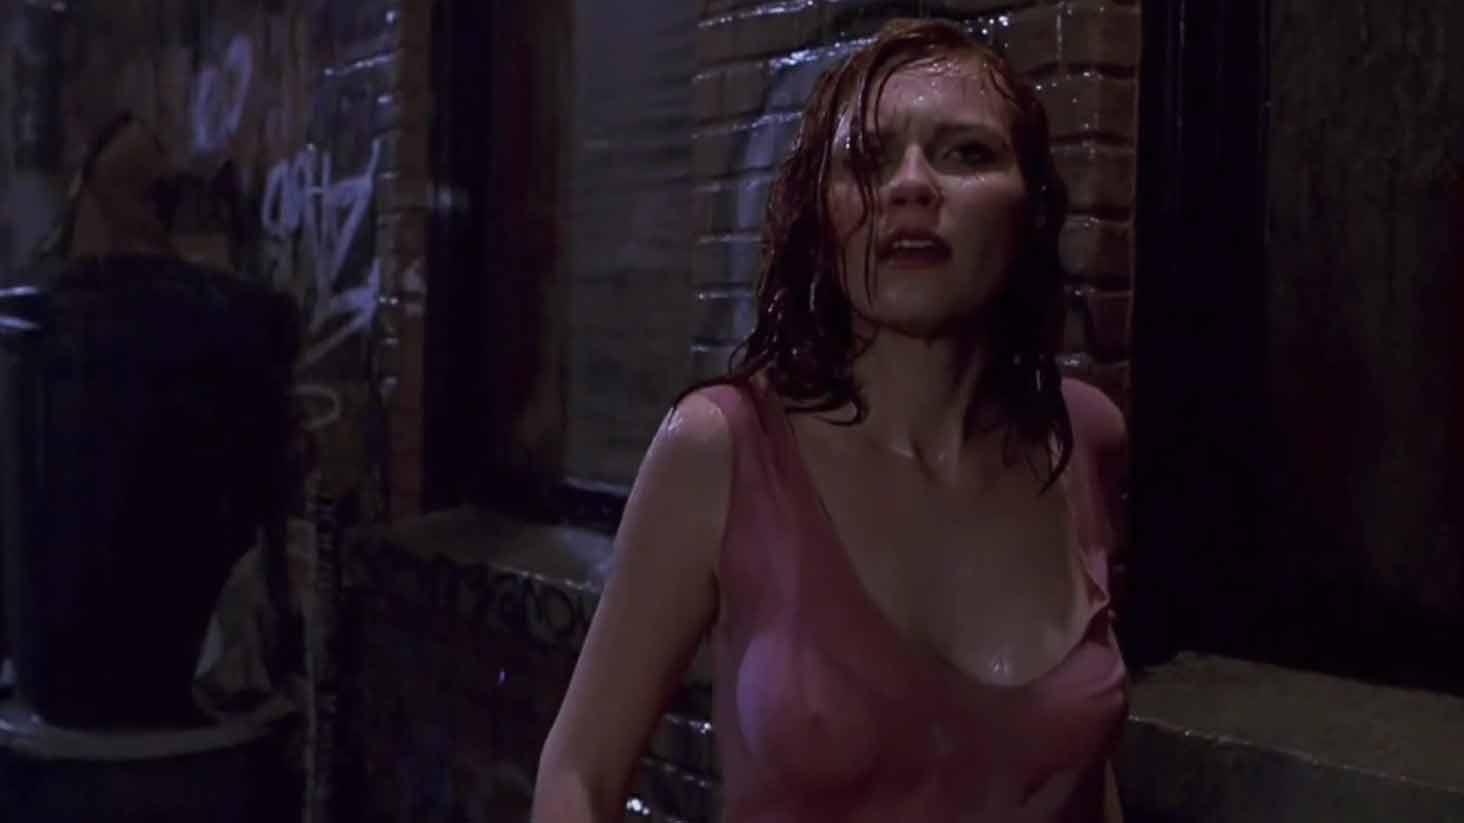 Kirsten Dunst's nipples in Spider-Man